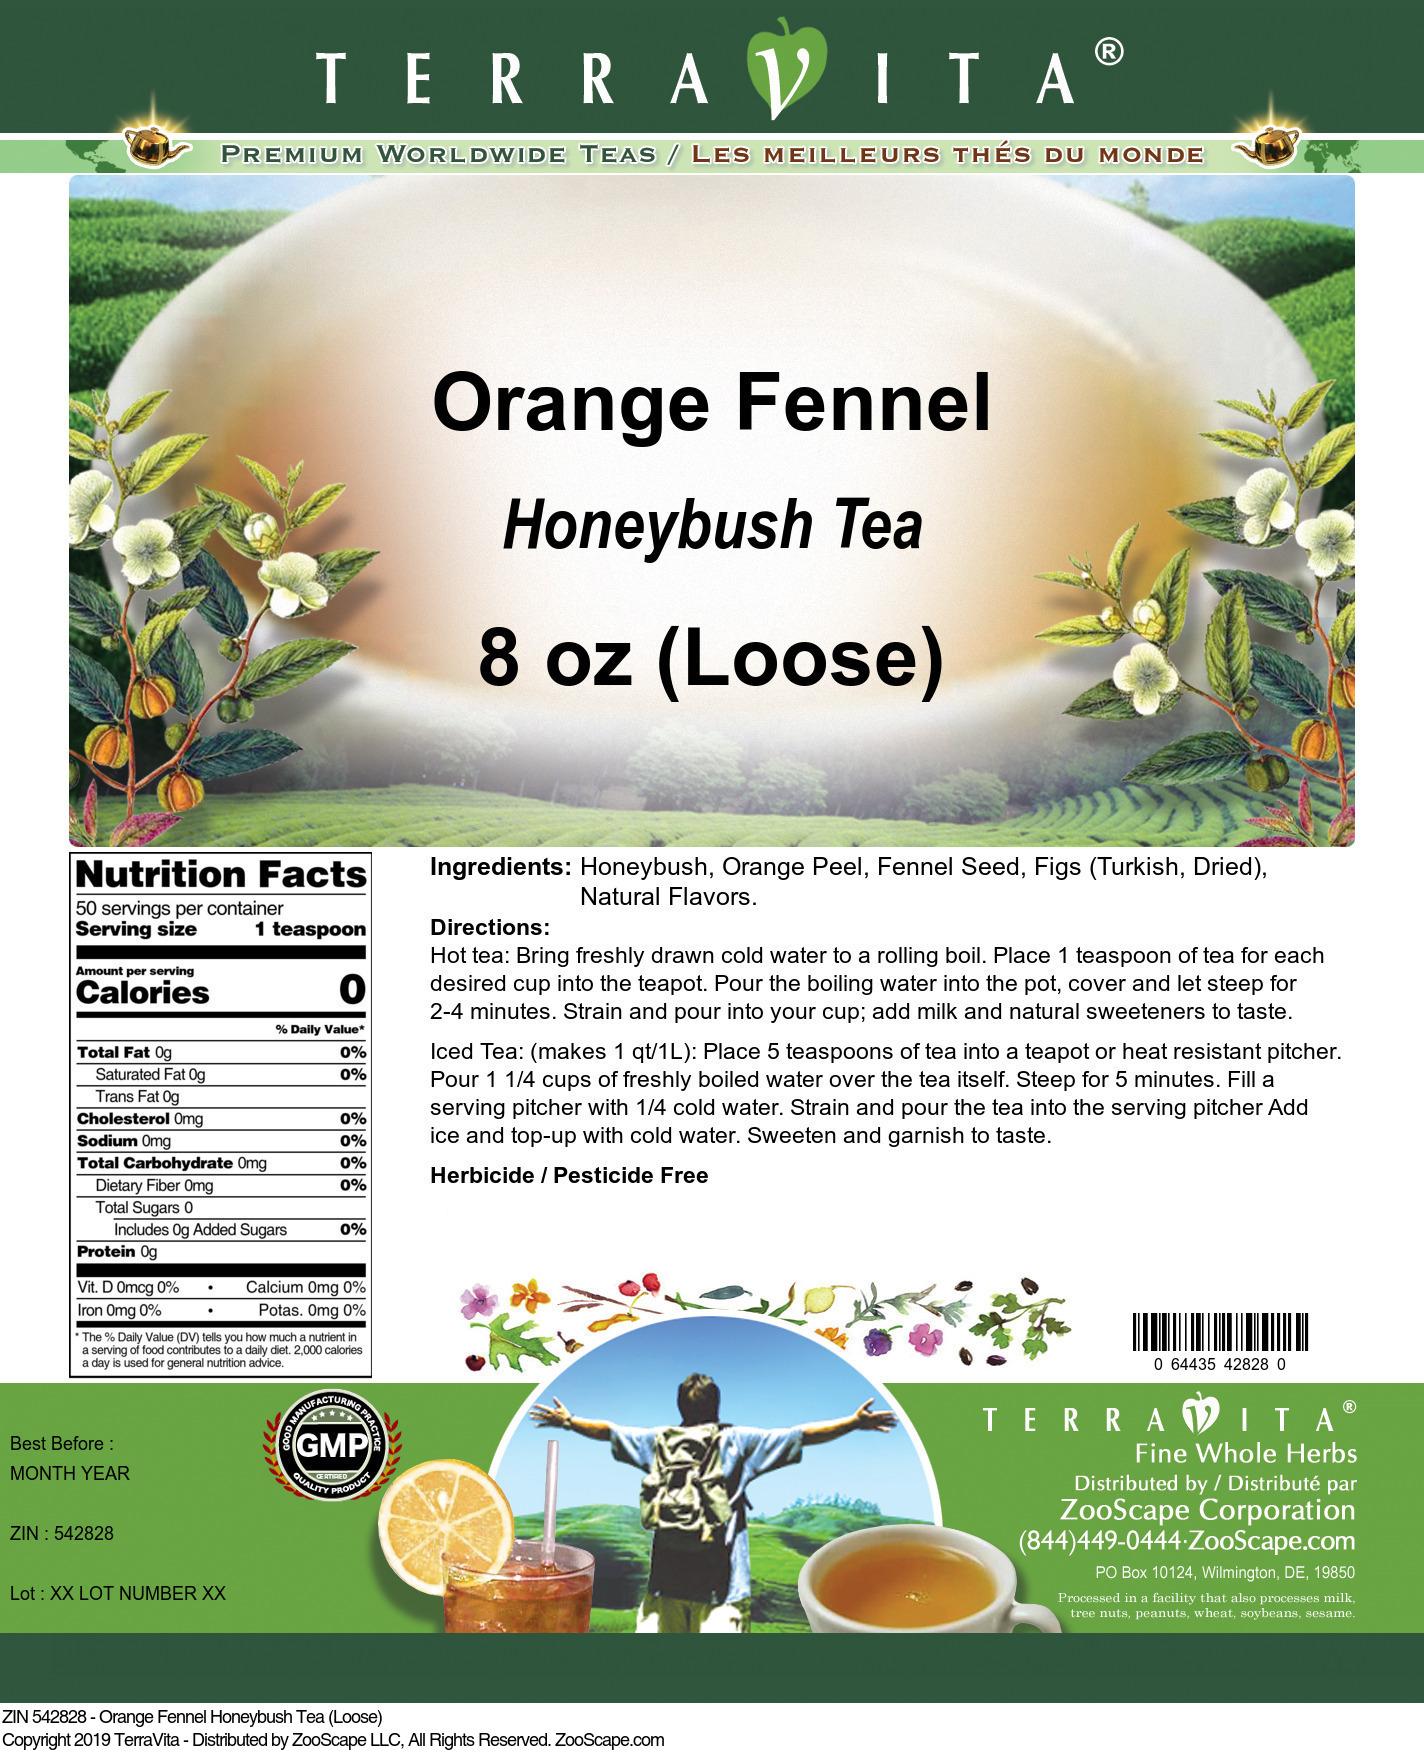 Orange Fennel Honeybush Tea